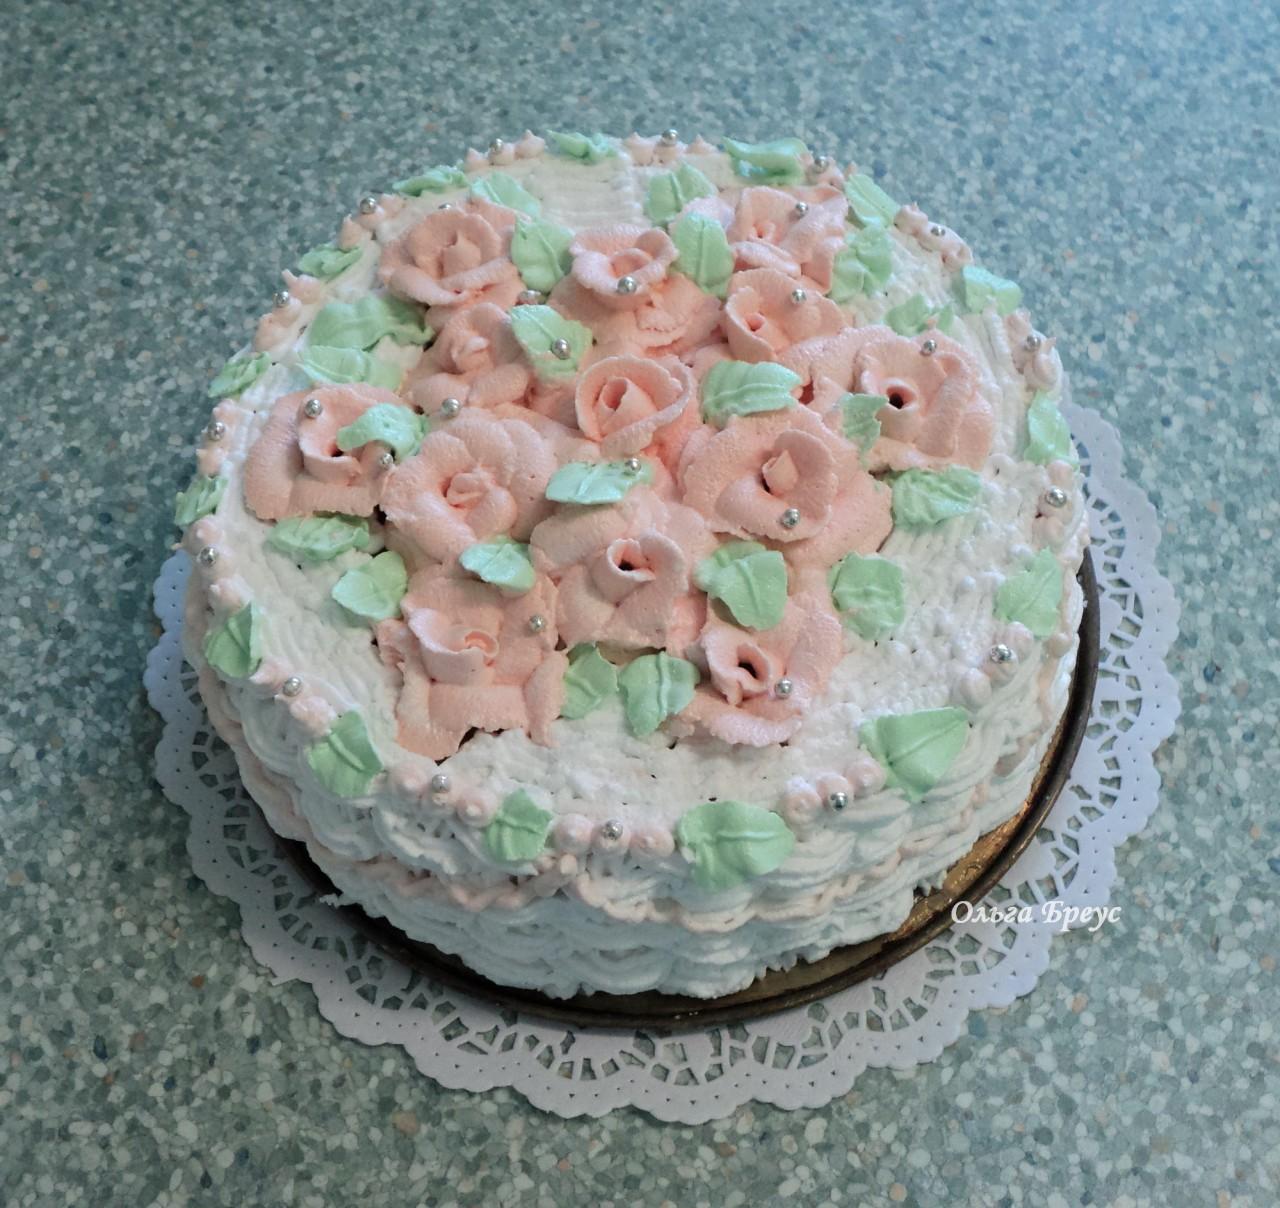 Торт из микроволновки -2. просто фото.